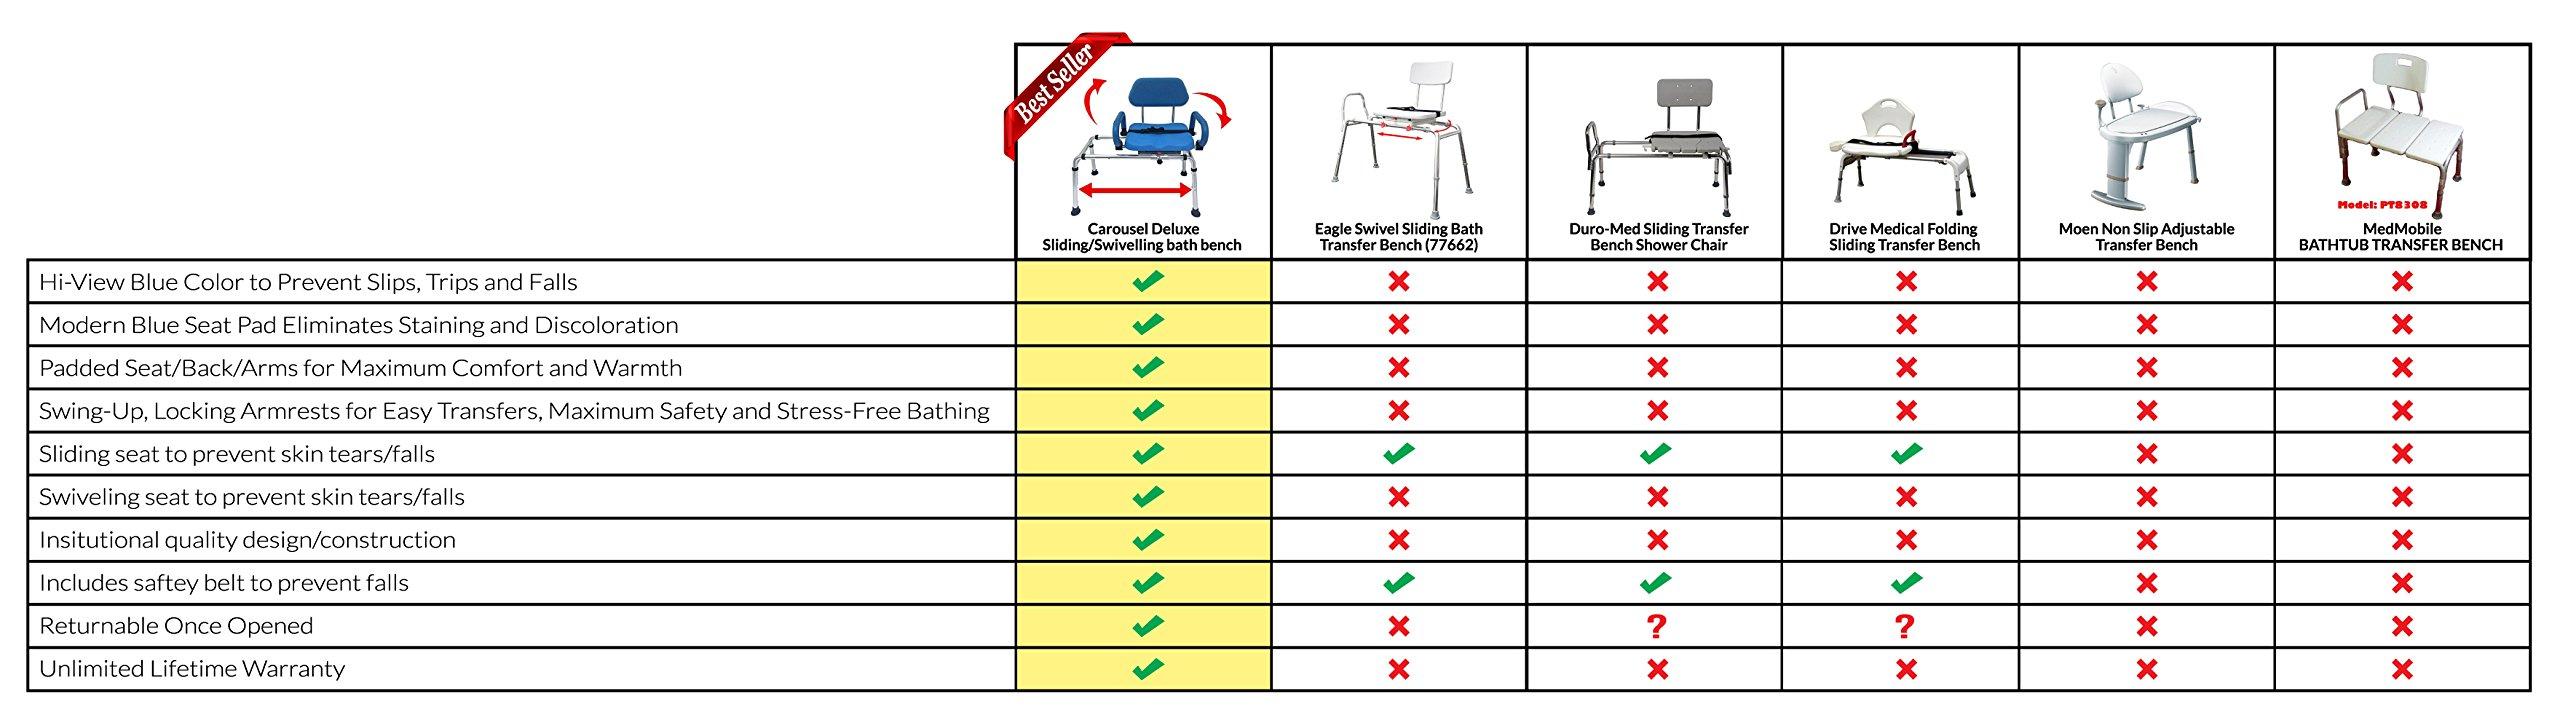 Carousel Sliding Transfer Bench with Swivel Seat. Premium PADDED ...